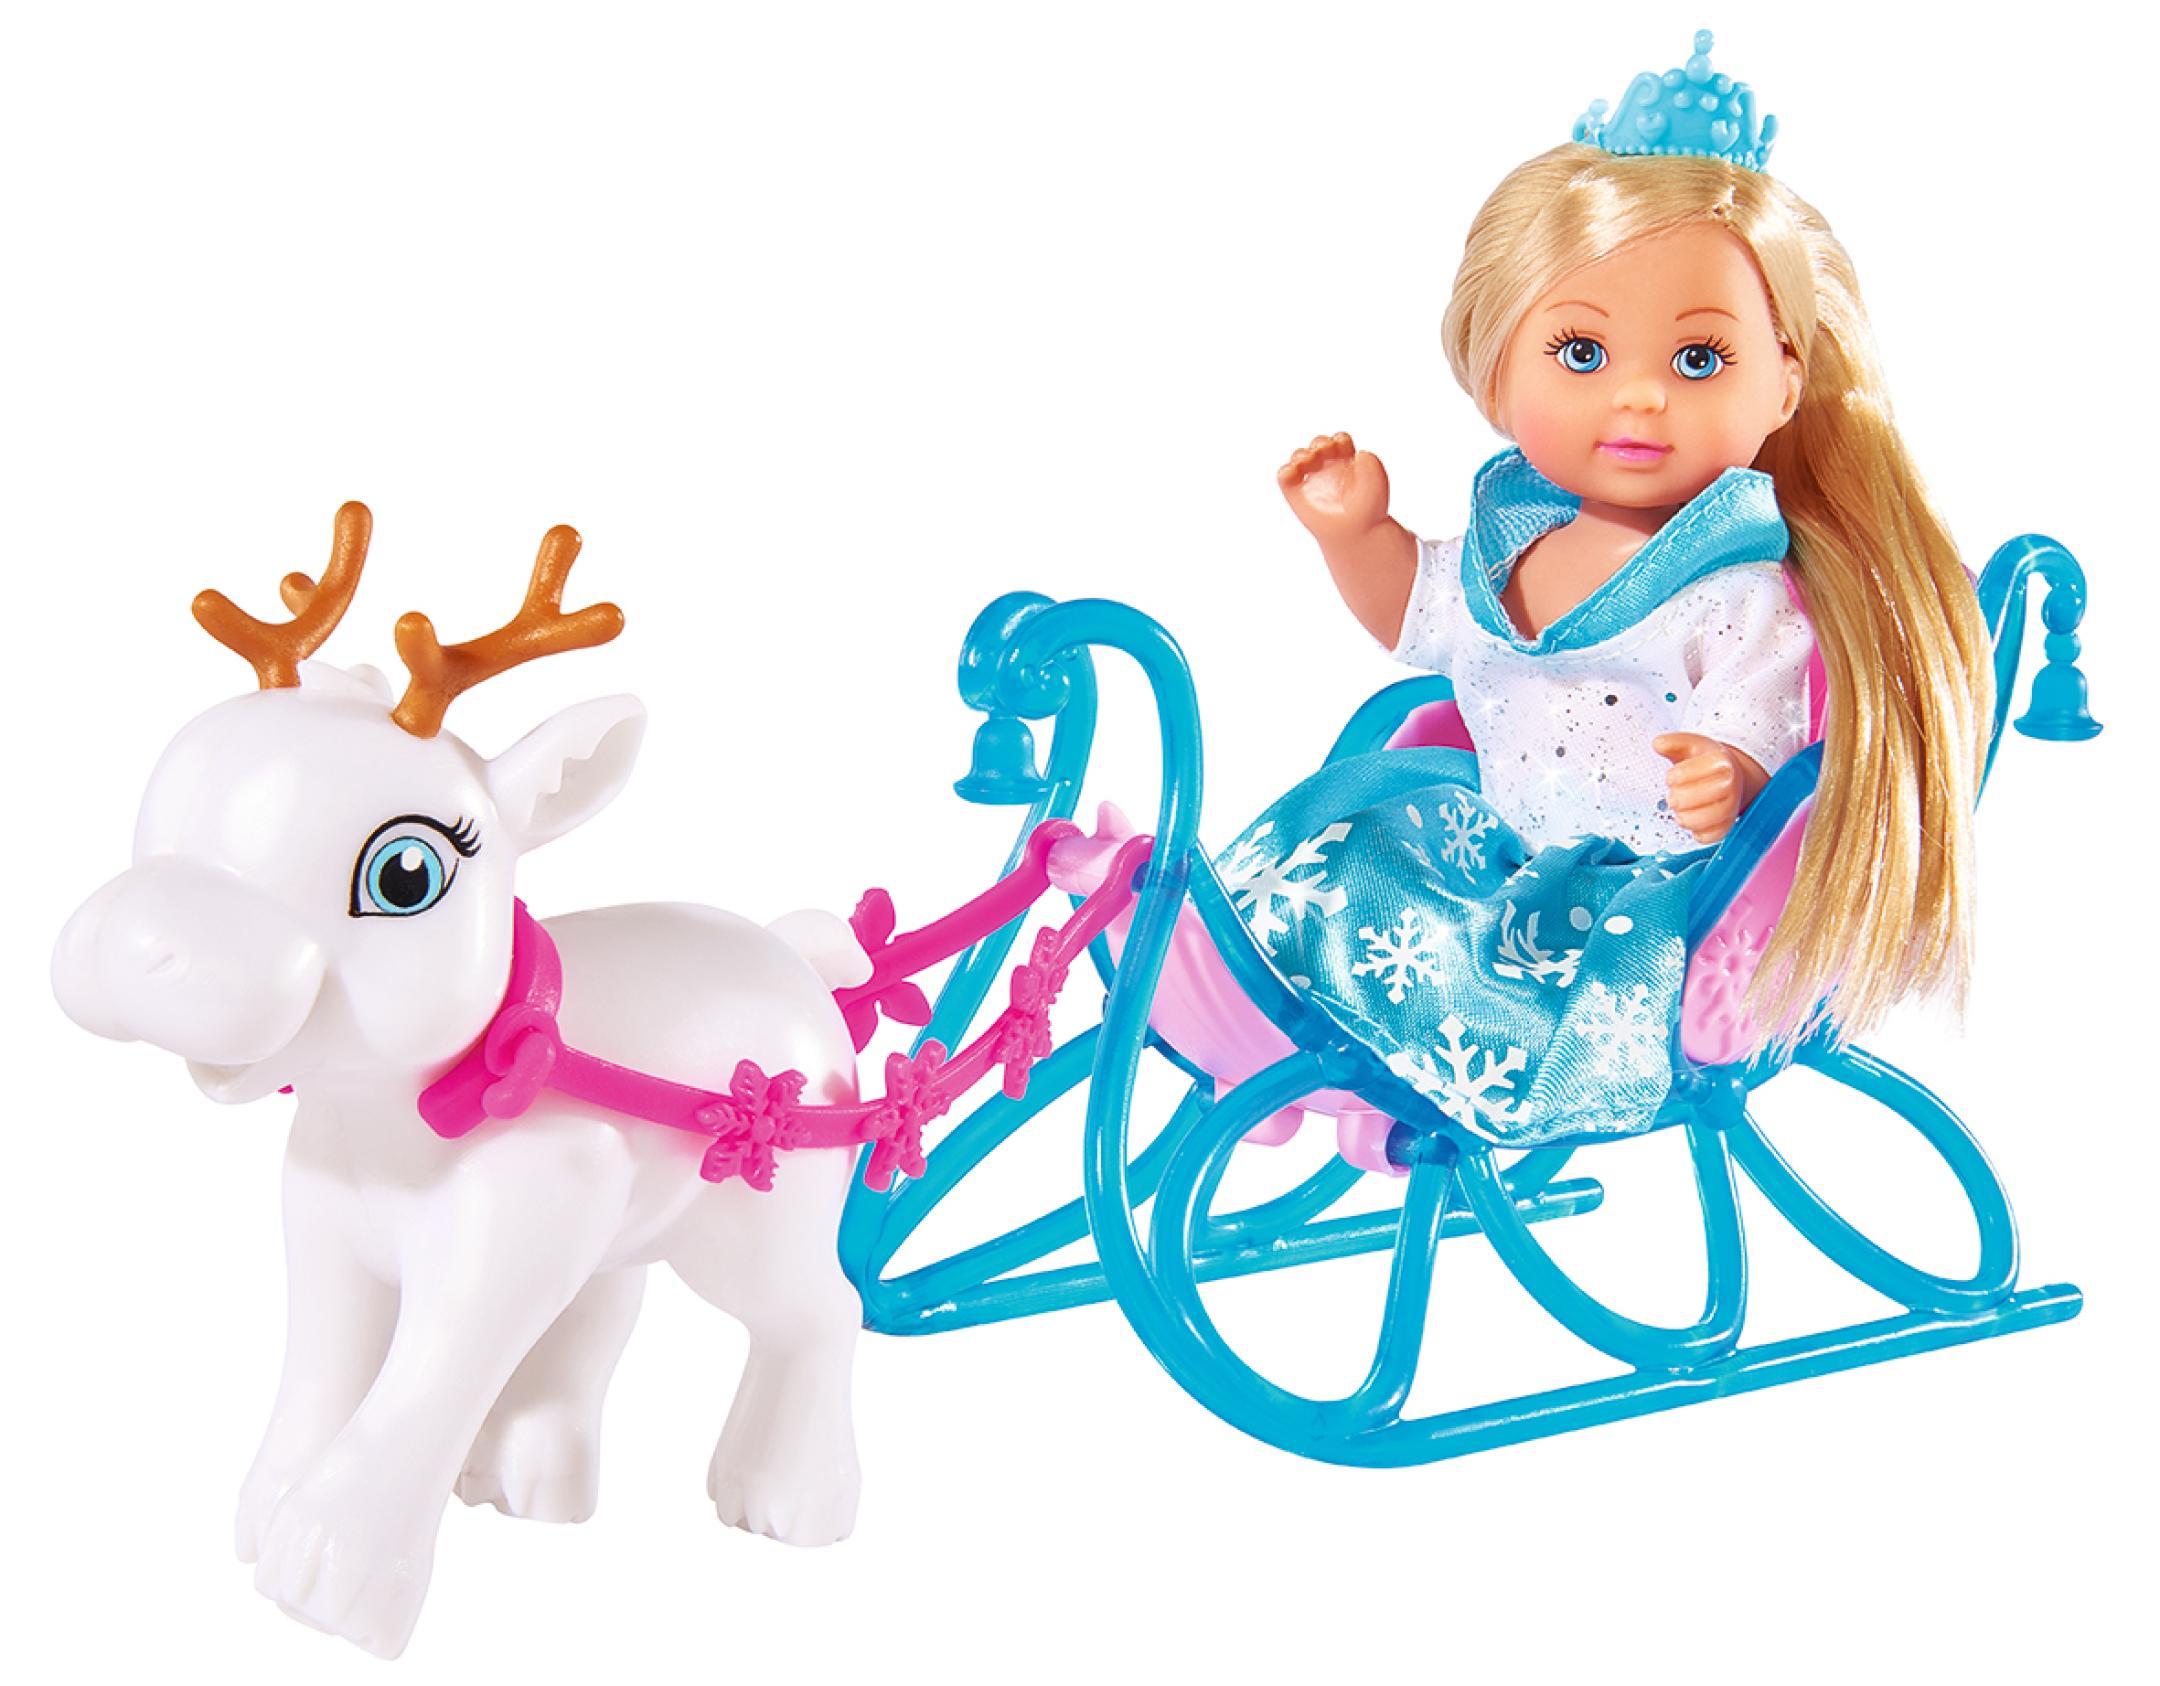 Купить Кукла Еви на санях, 12 см., Simba